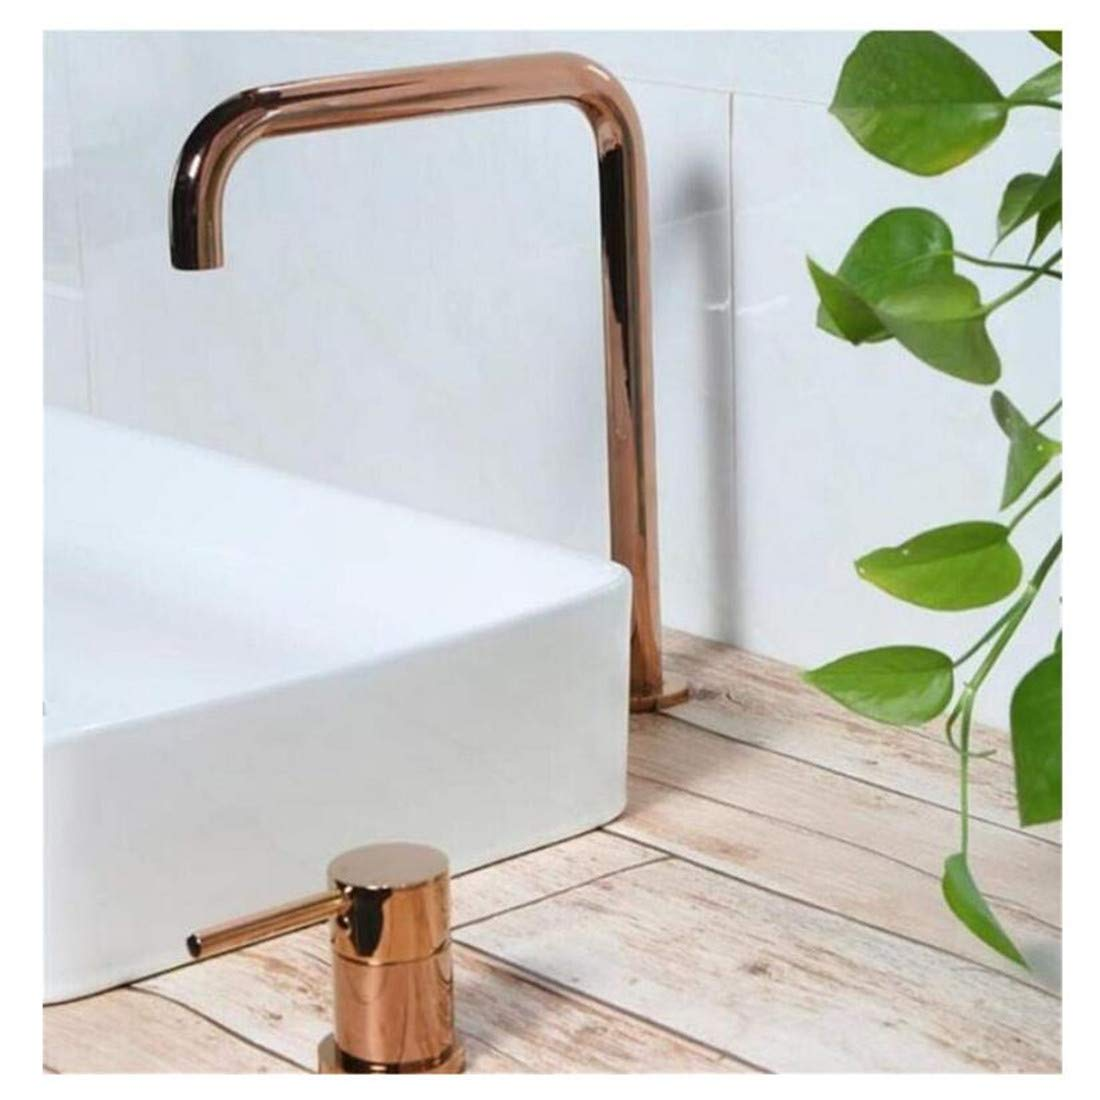 Stainless Steel Vintage Brassbathroom Super Long Pipe Two Holes Basin Faucet Bathroom Faucet Sink Tap 360 redating